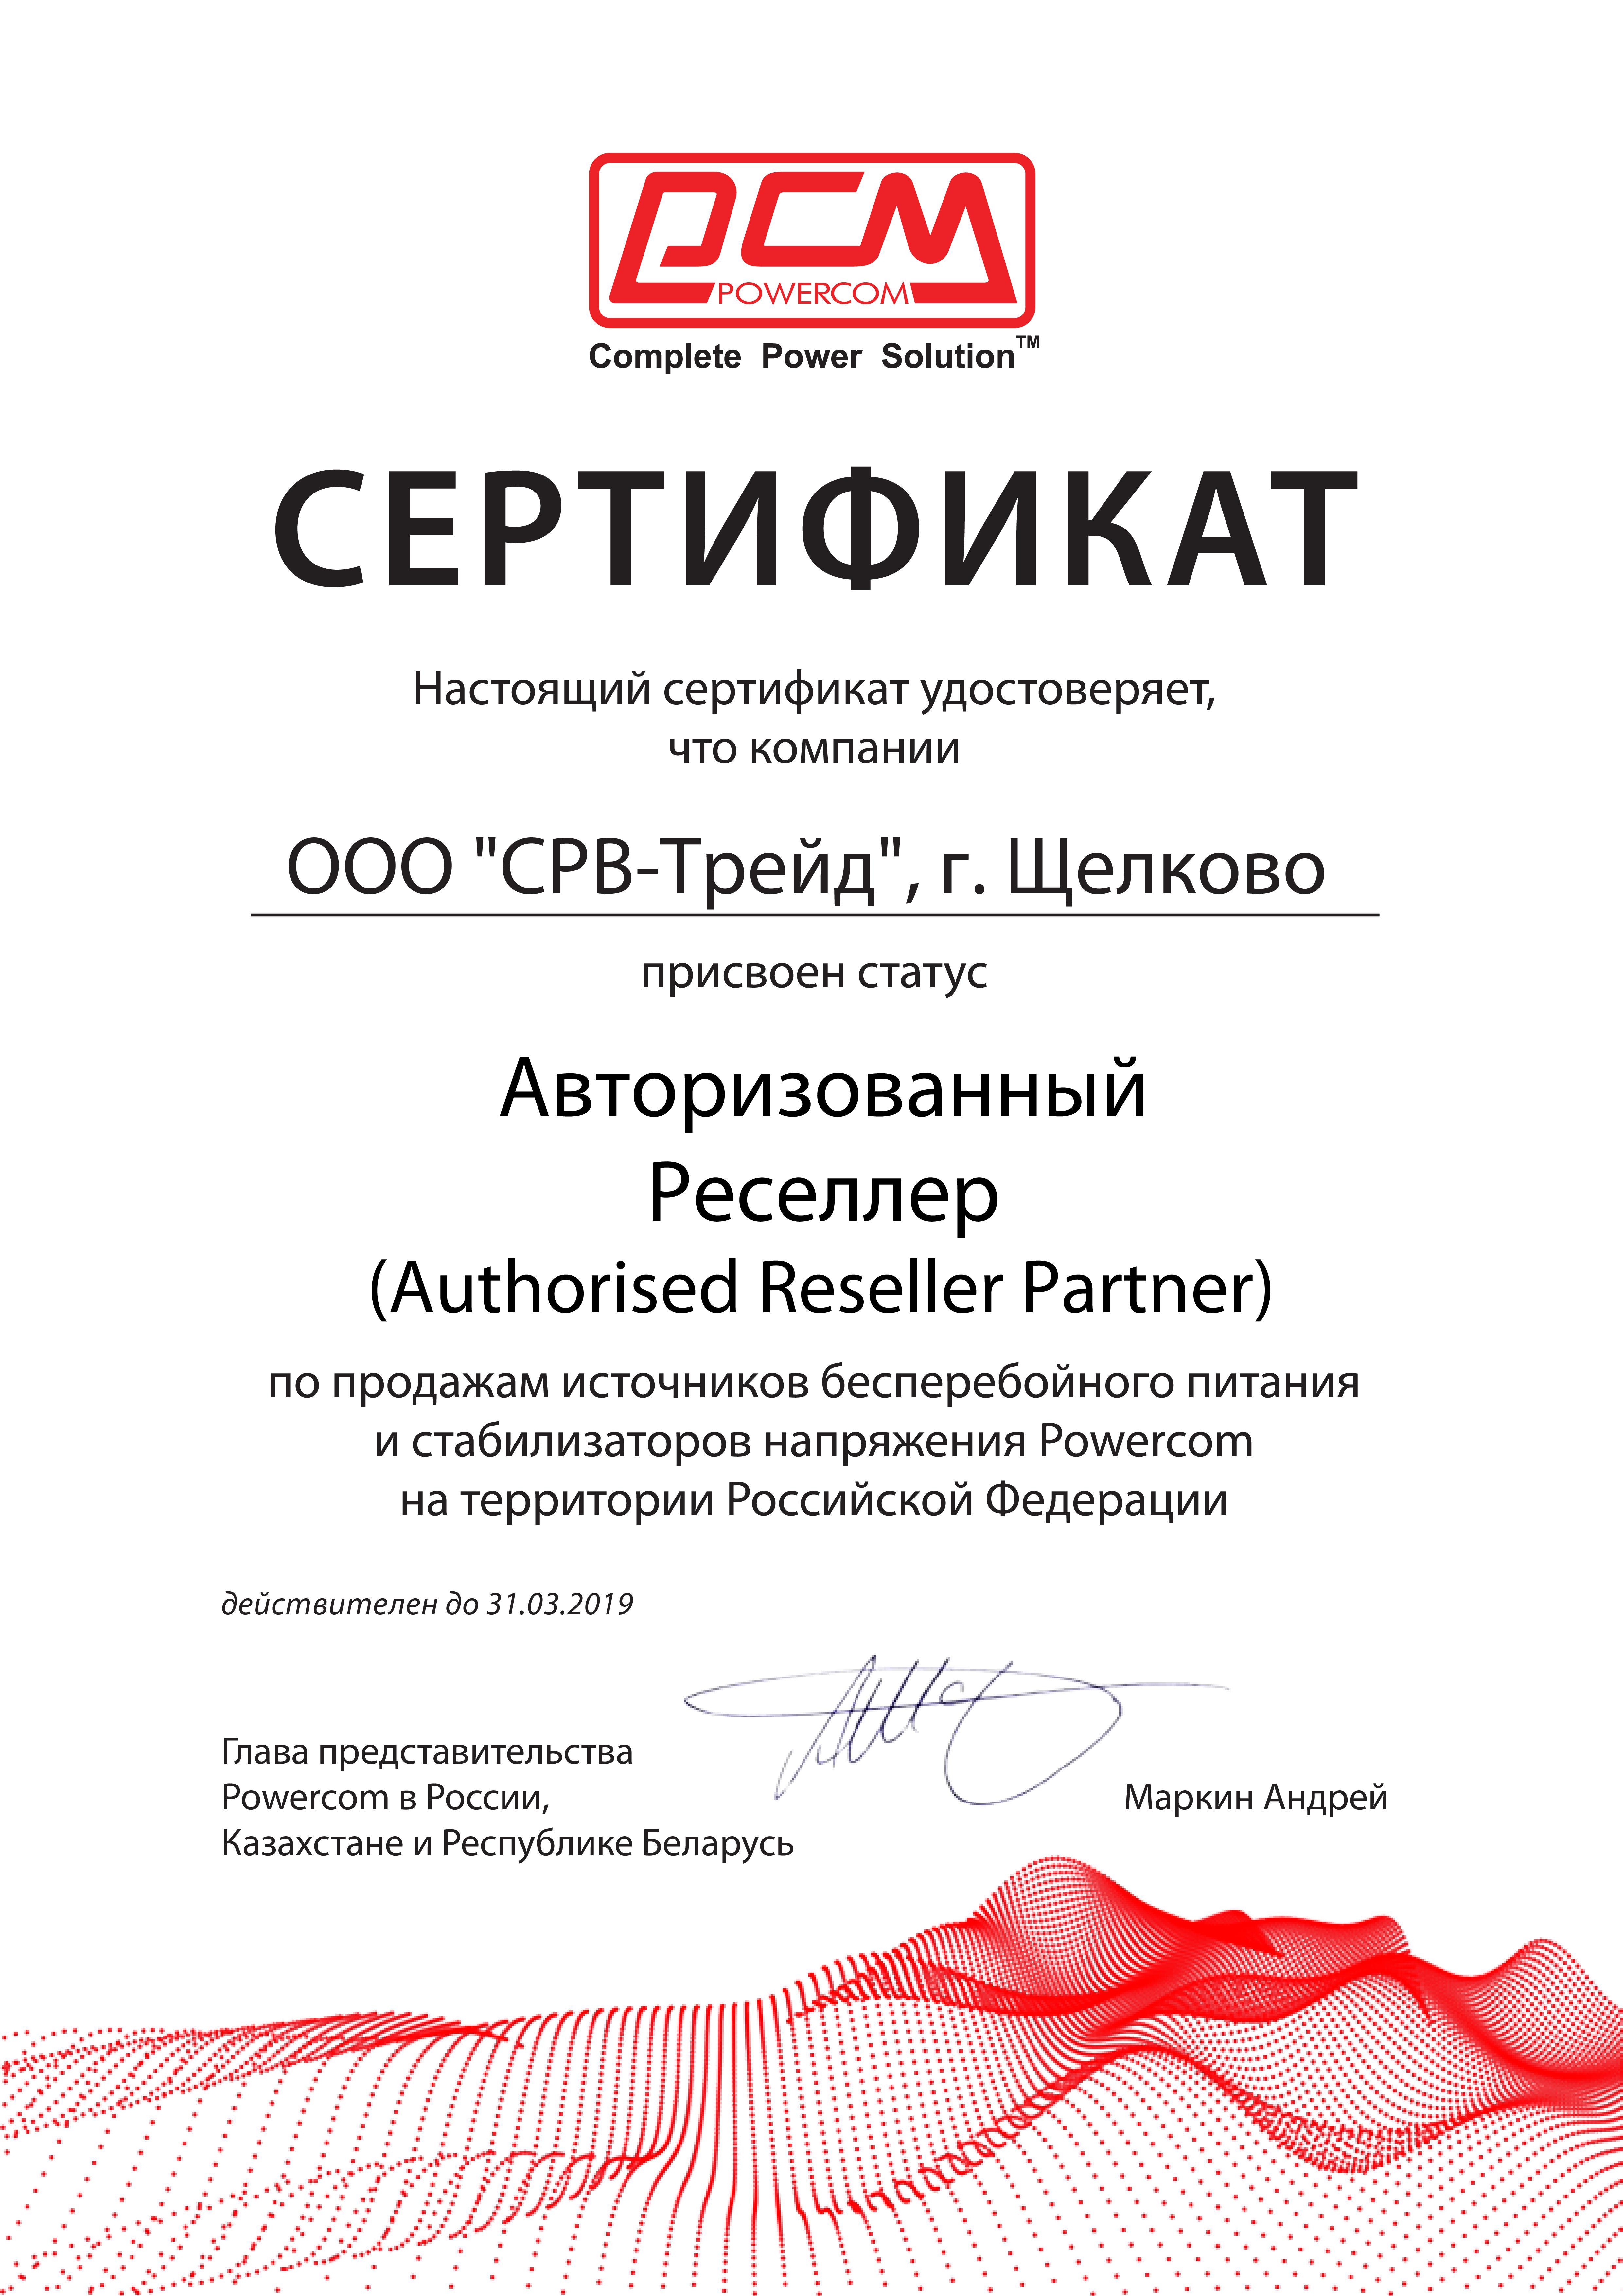 Сертификат SRV-TRADE как партнера Powercom